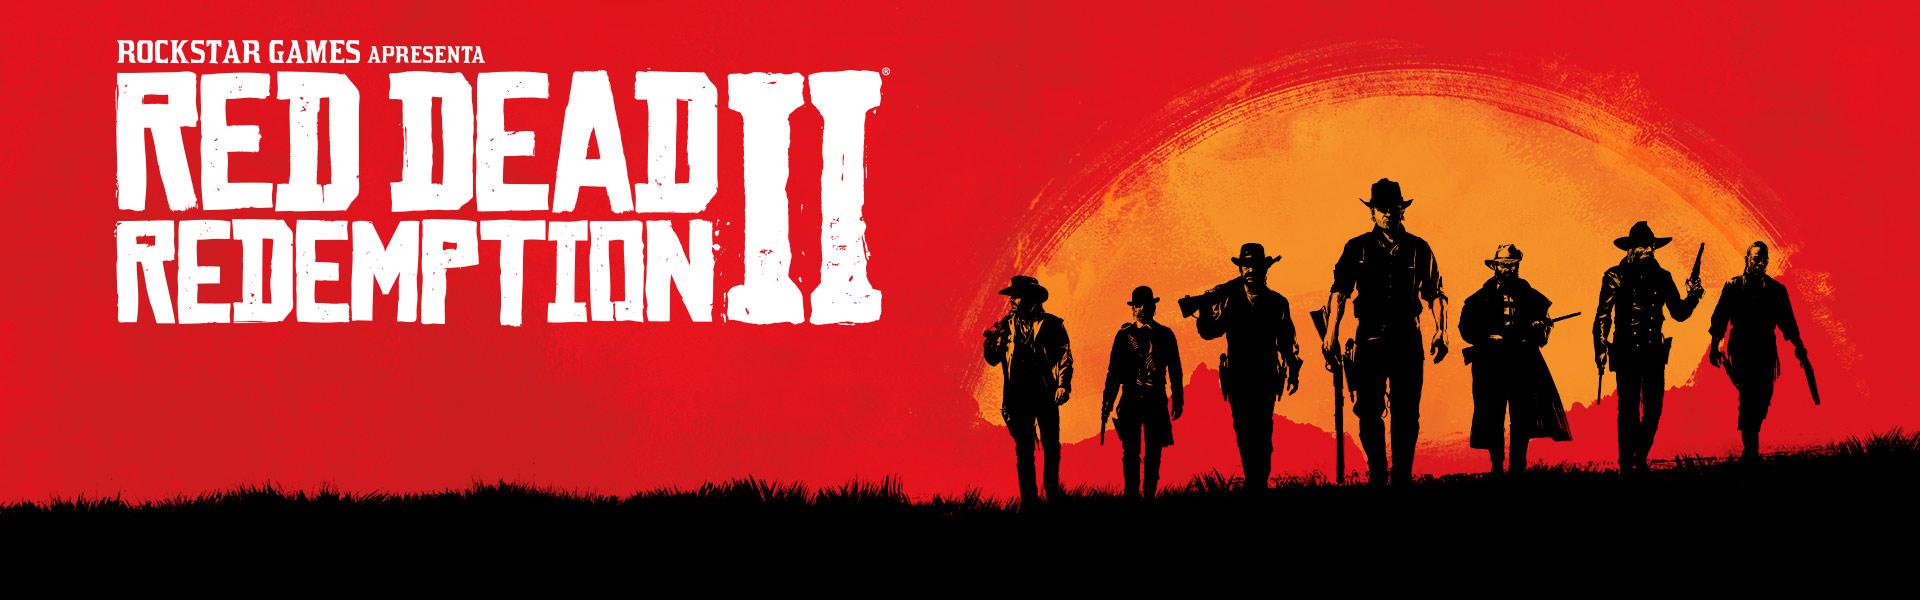 Red Dead Redemption 2 hero